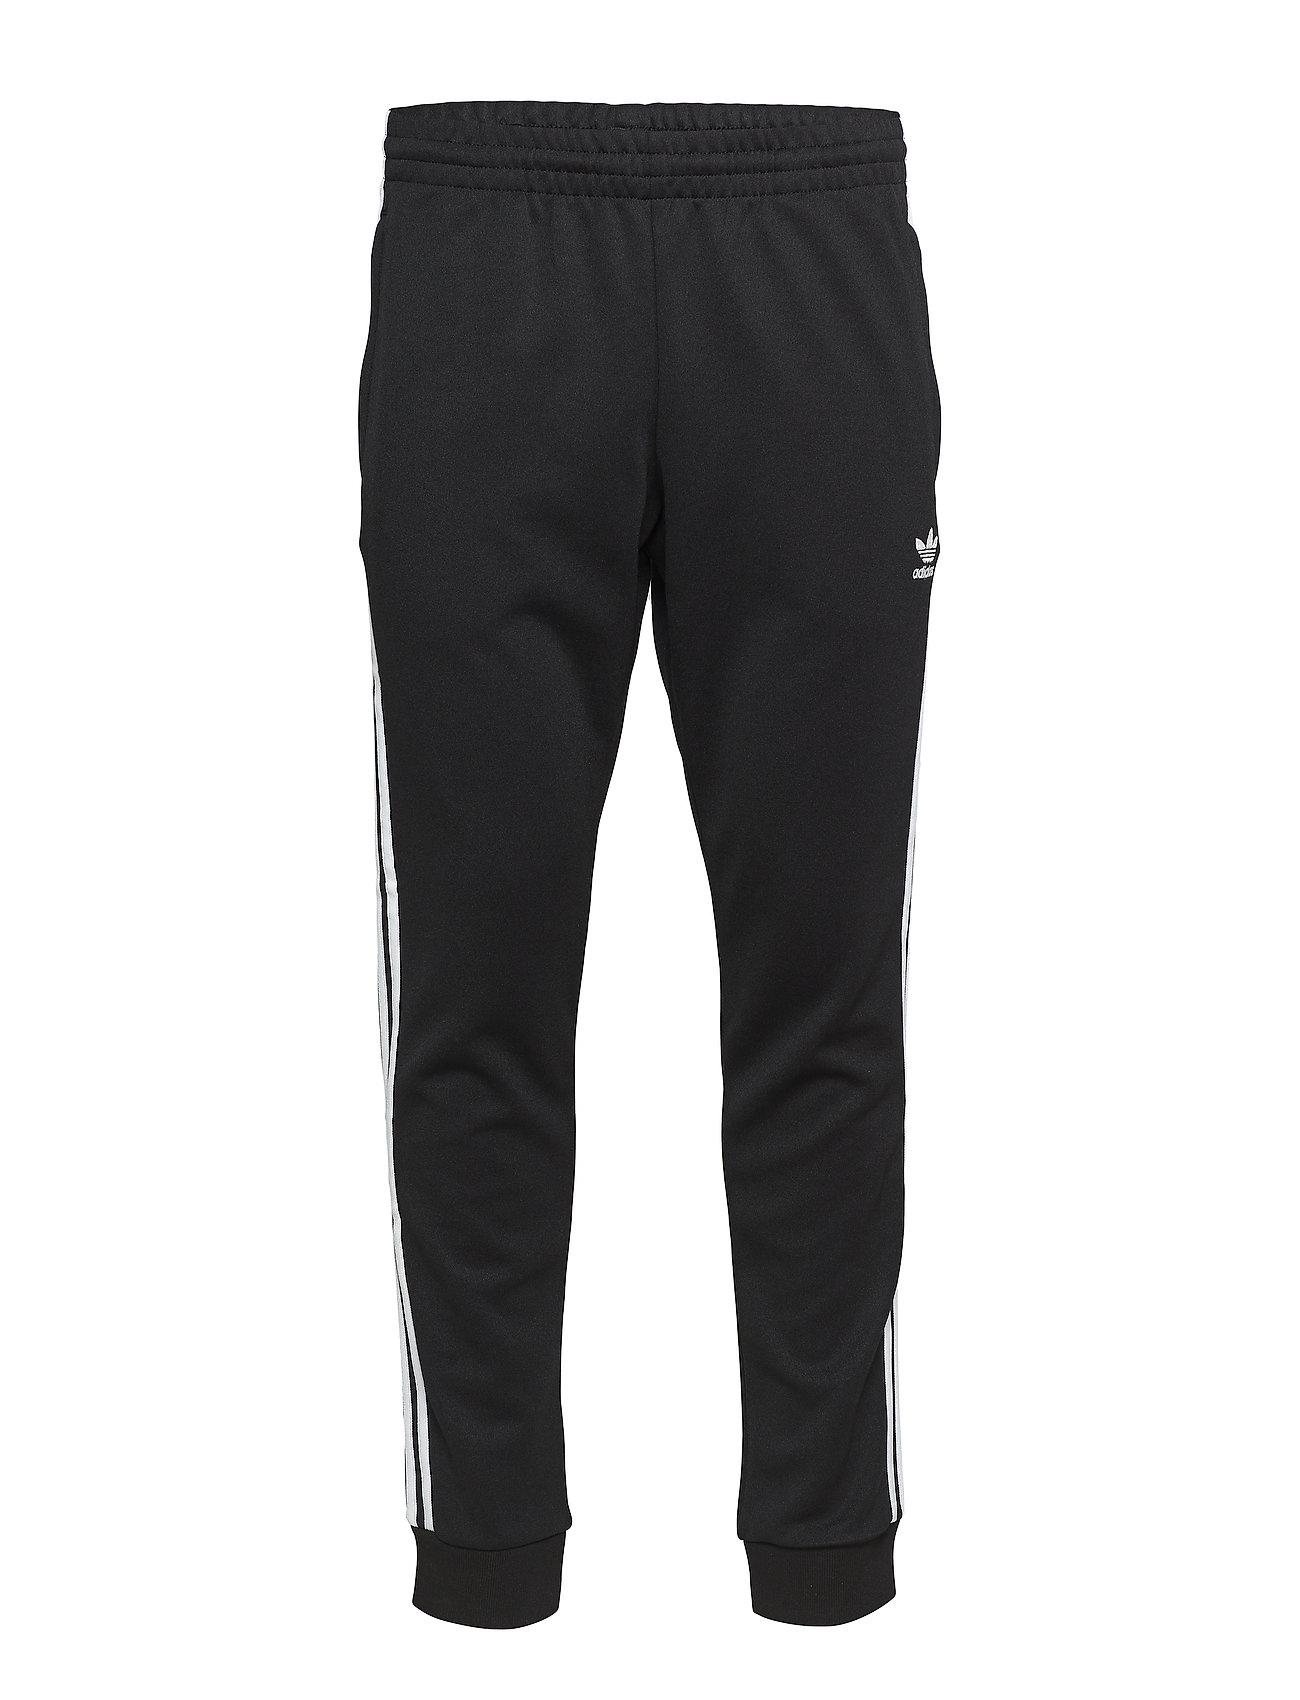 adidas Originals SST TP - BLACK